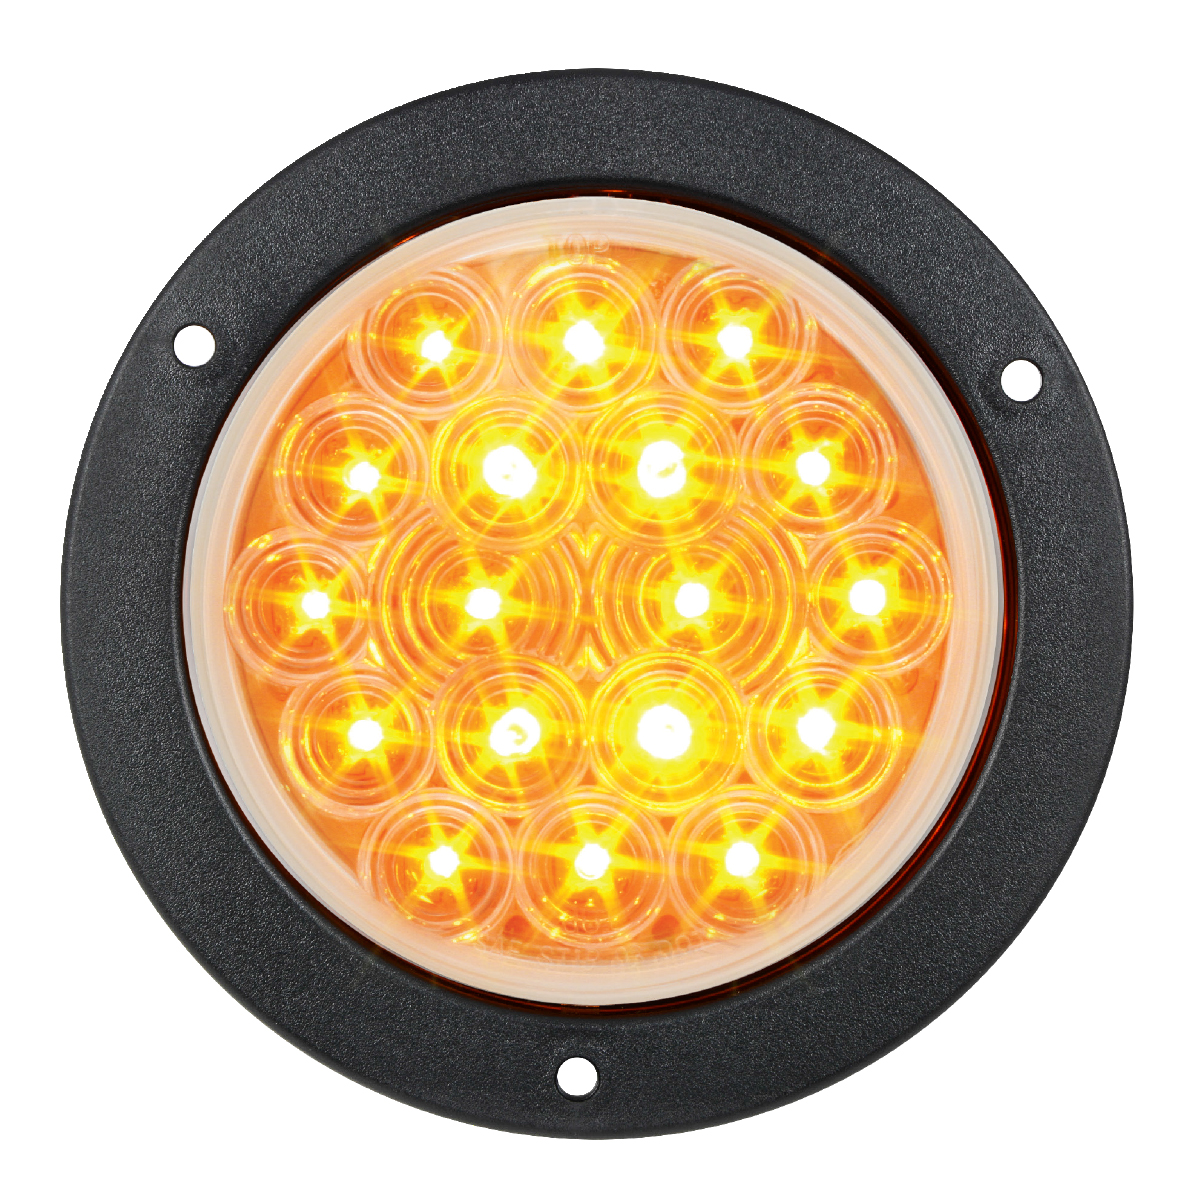 "75911 Amber/Clear 4"" Fleet LED Light with Black Flange Mount"